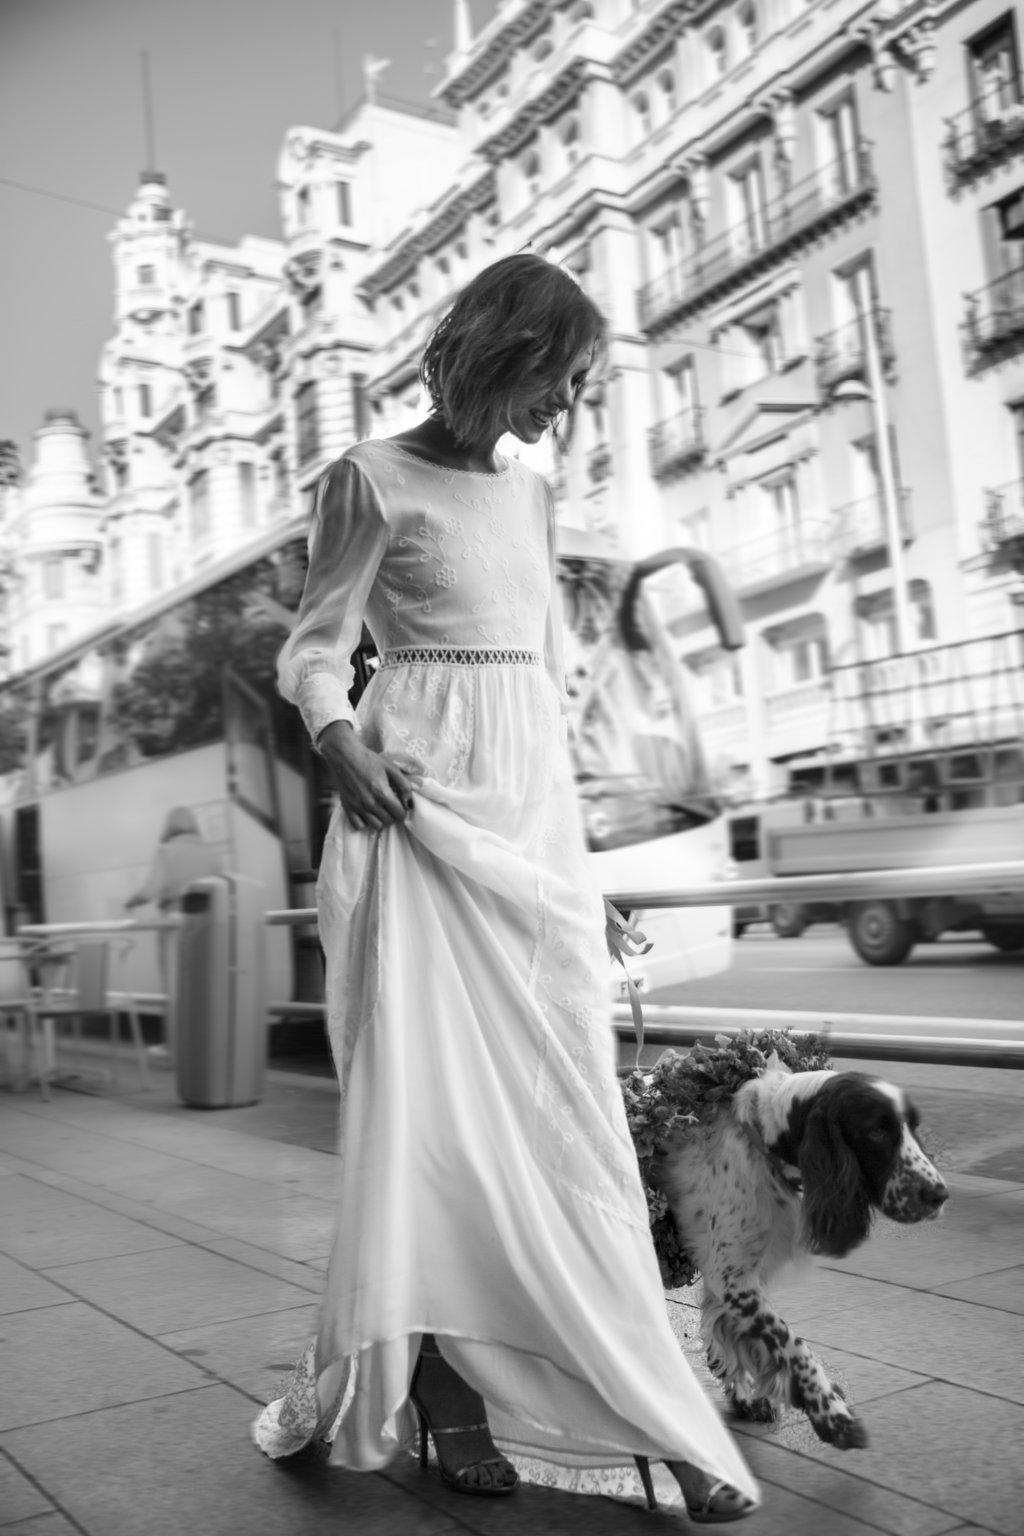 intropia atelier vestdos de novia 2017 FO2A0174-2r-3